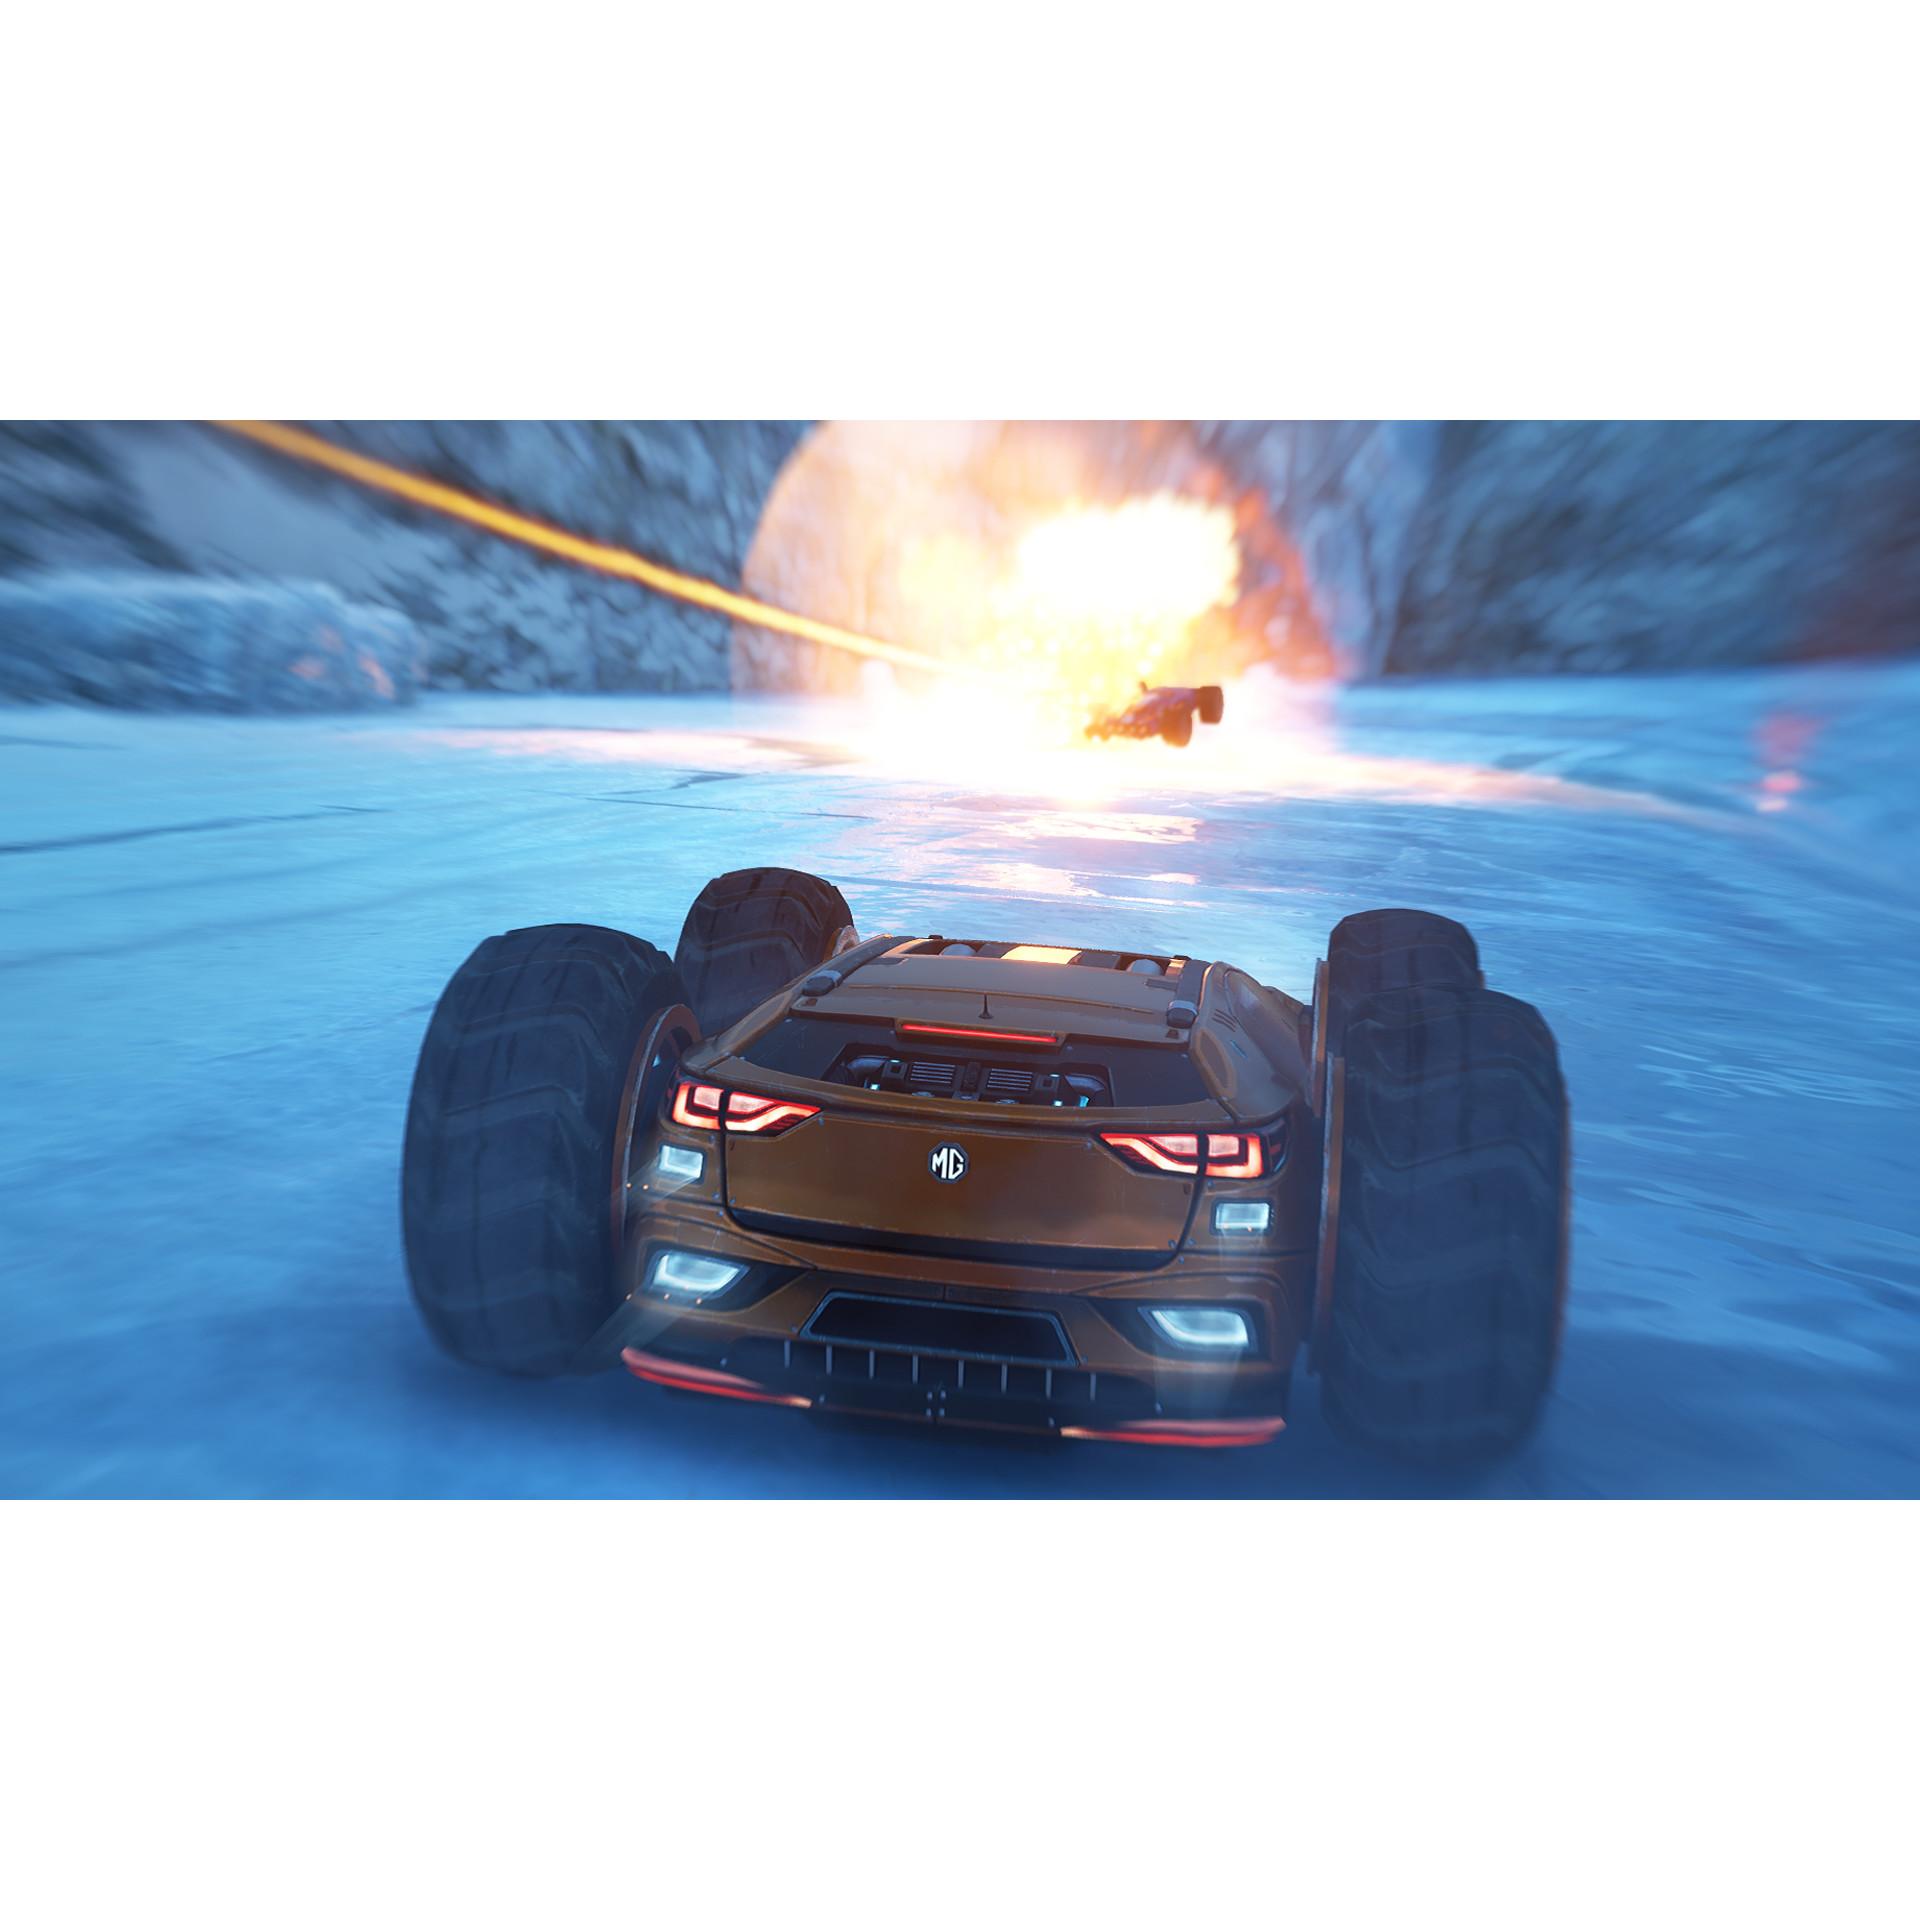 Joc GRIP: Combat Racing - Airblades vs Rollers - Ultimate Edition (EU) Pentru PlayStation 4 4